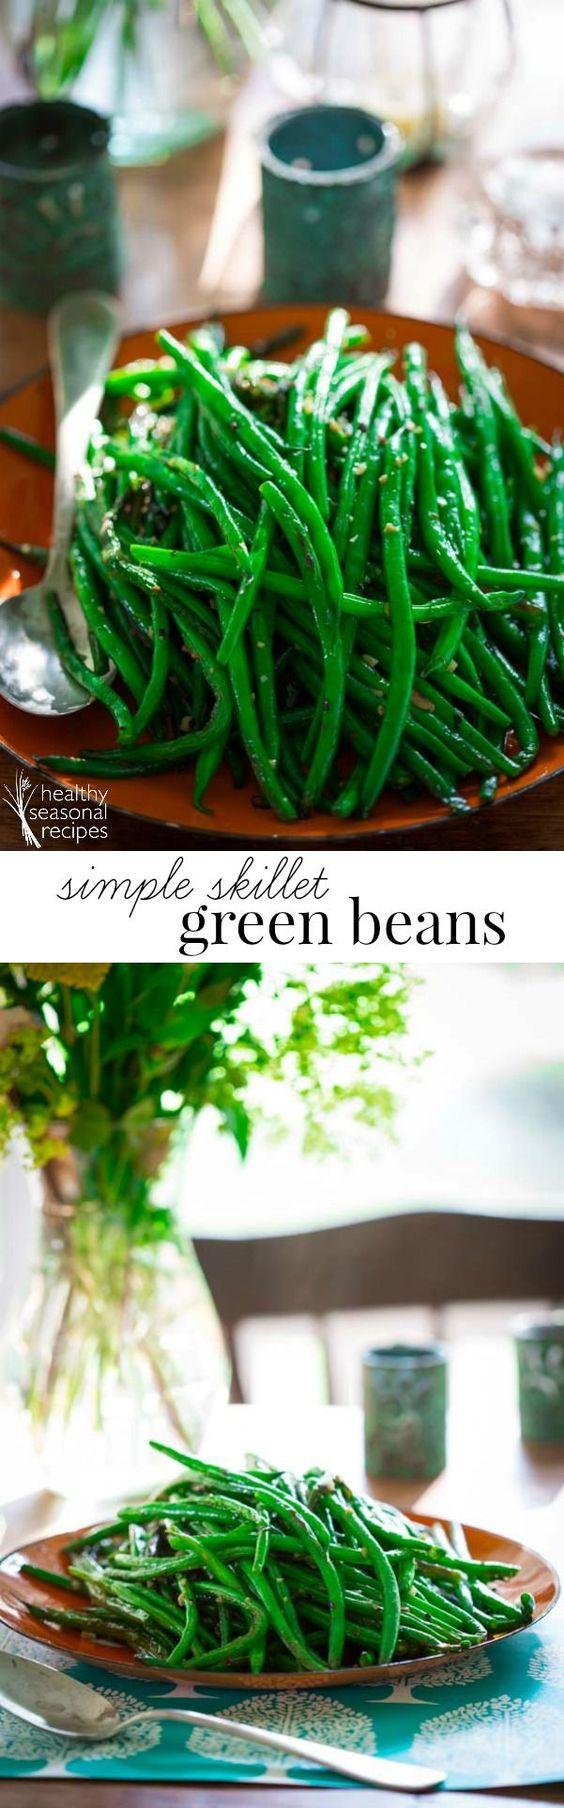 Simple Skillet Green Beans by healthyseasonalrecipes #Green_Beans #Easy #Healthy